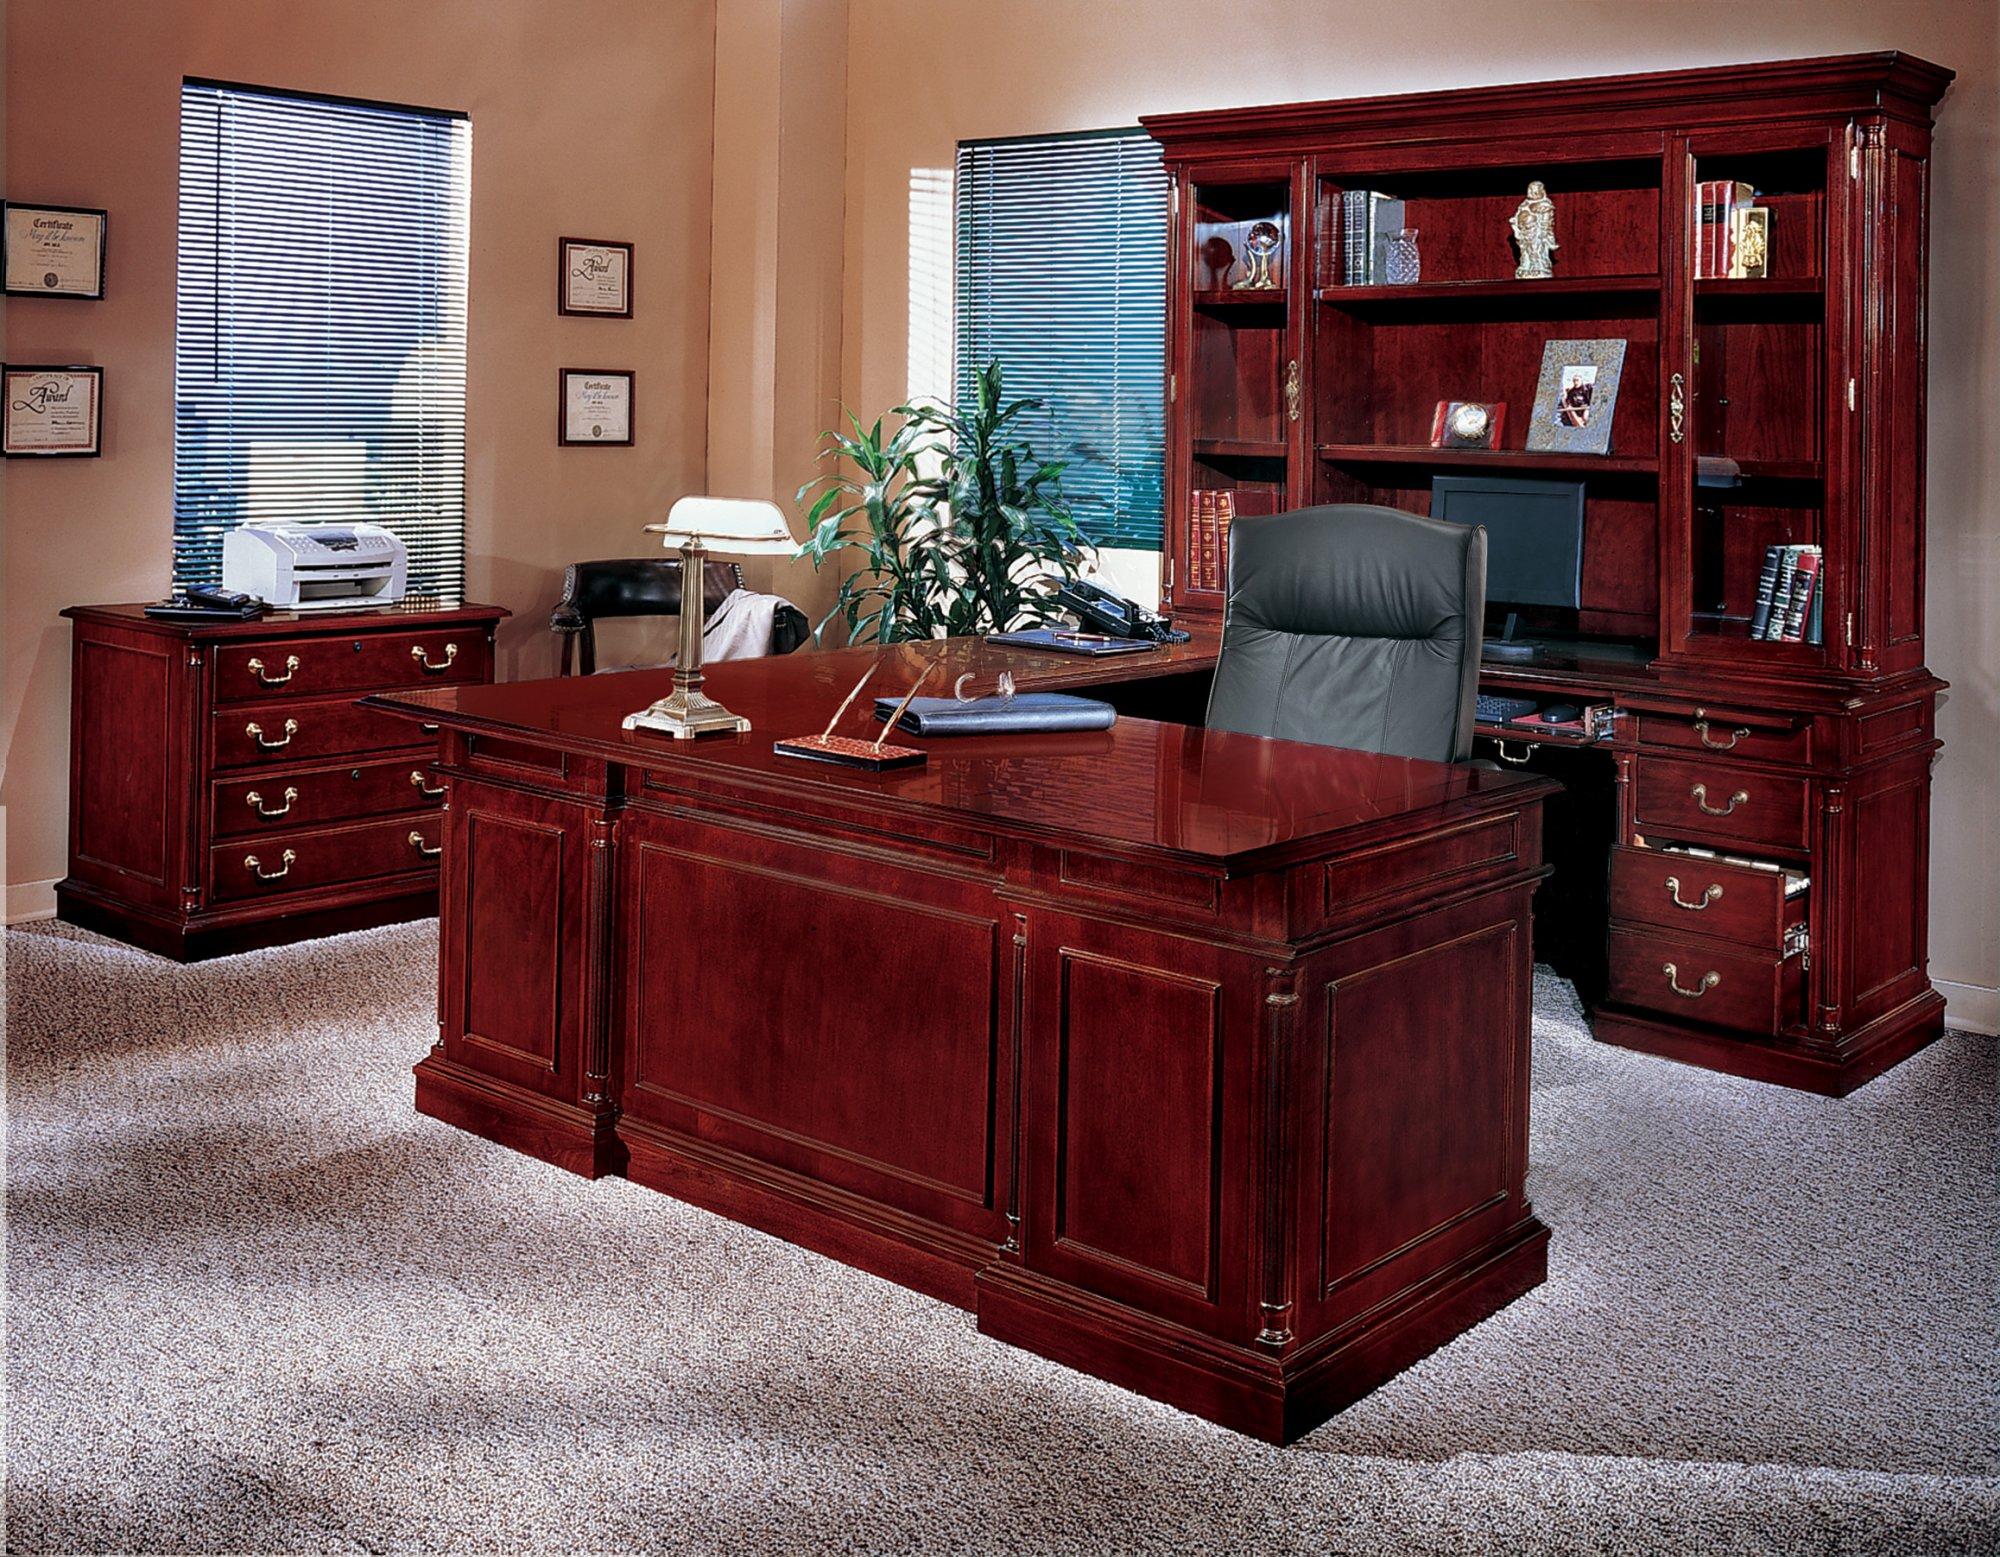 Next office desk Window Share Via Email Download Highresolution Image Keswick Flexsteelcom